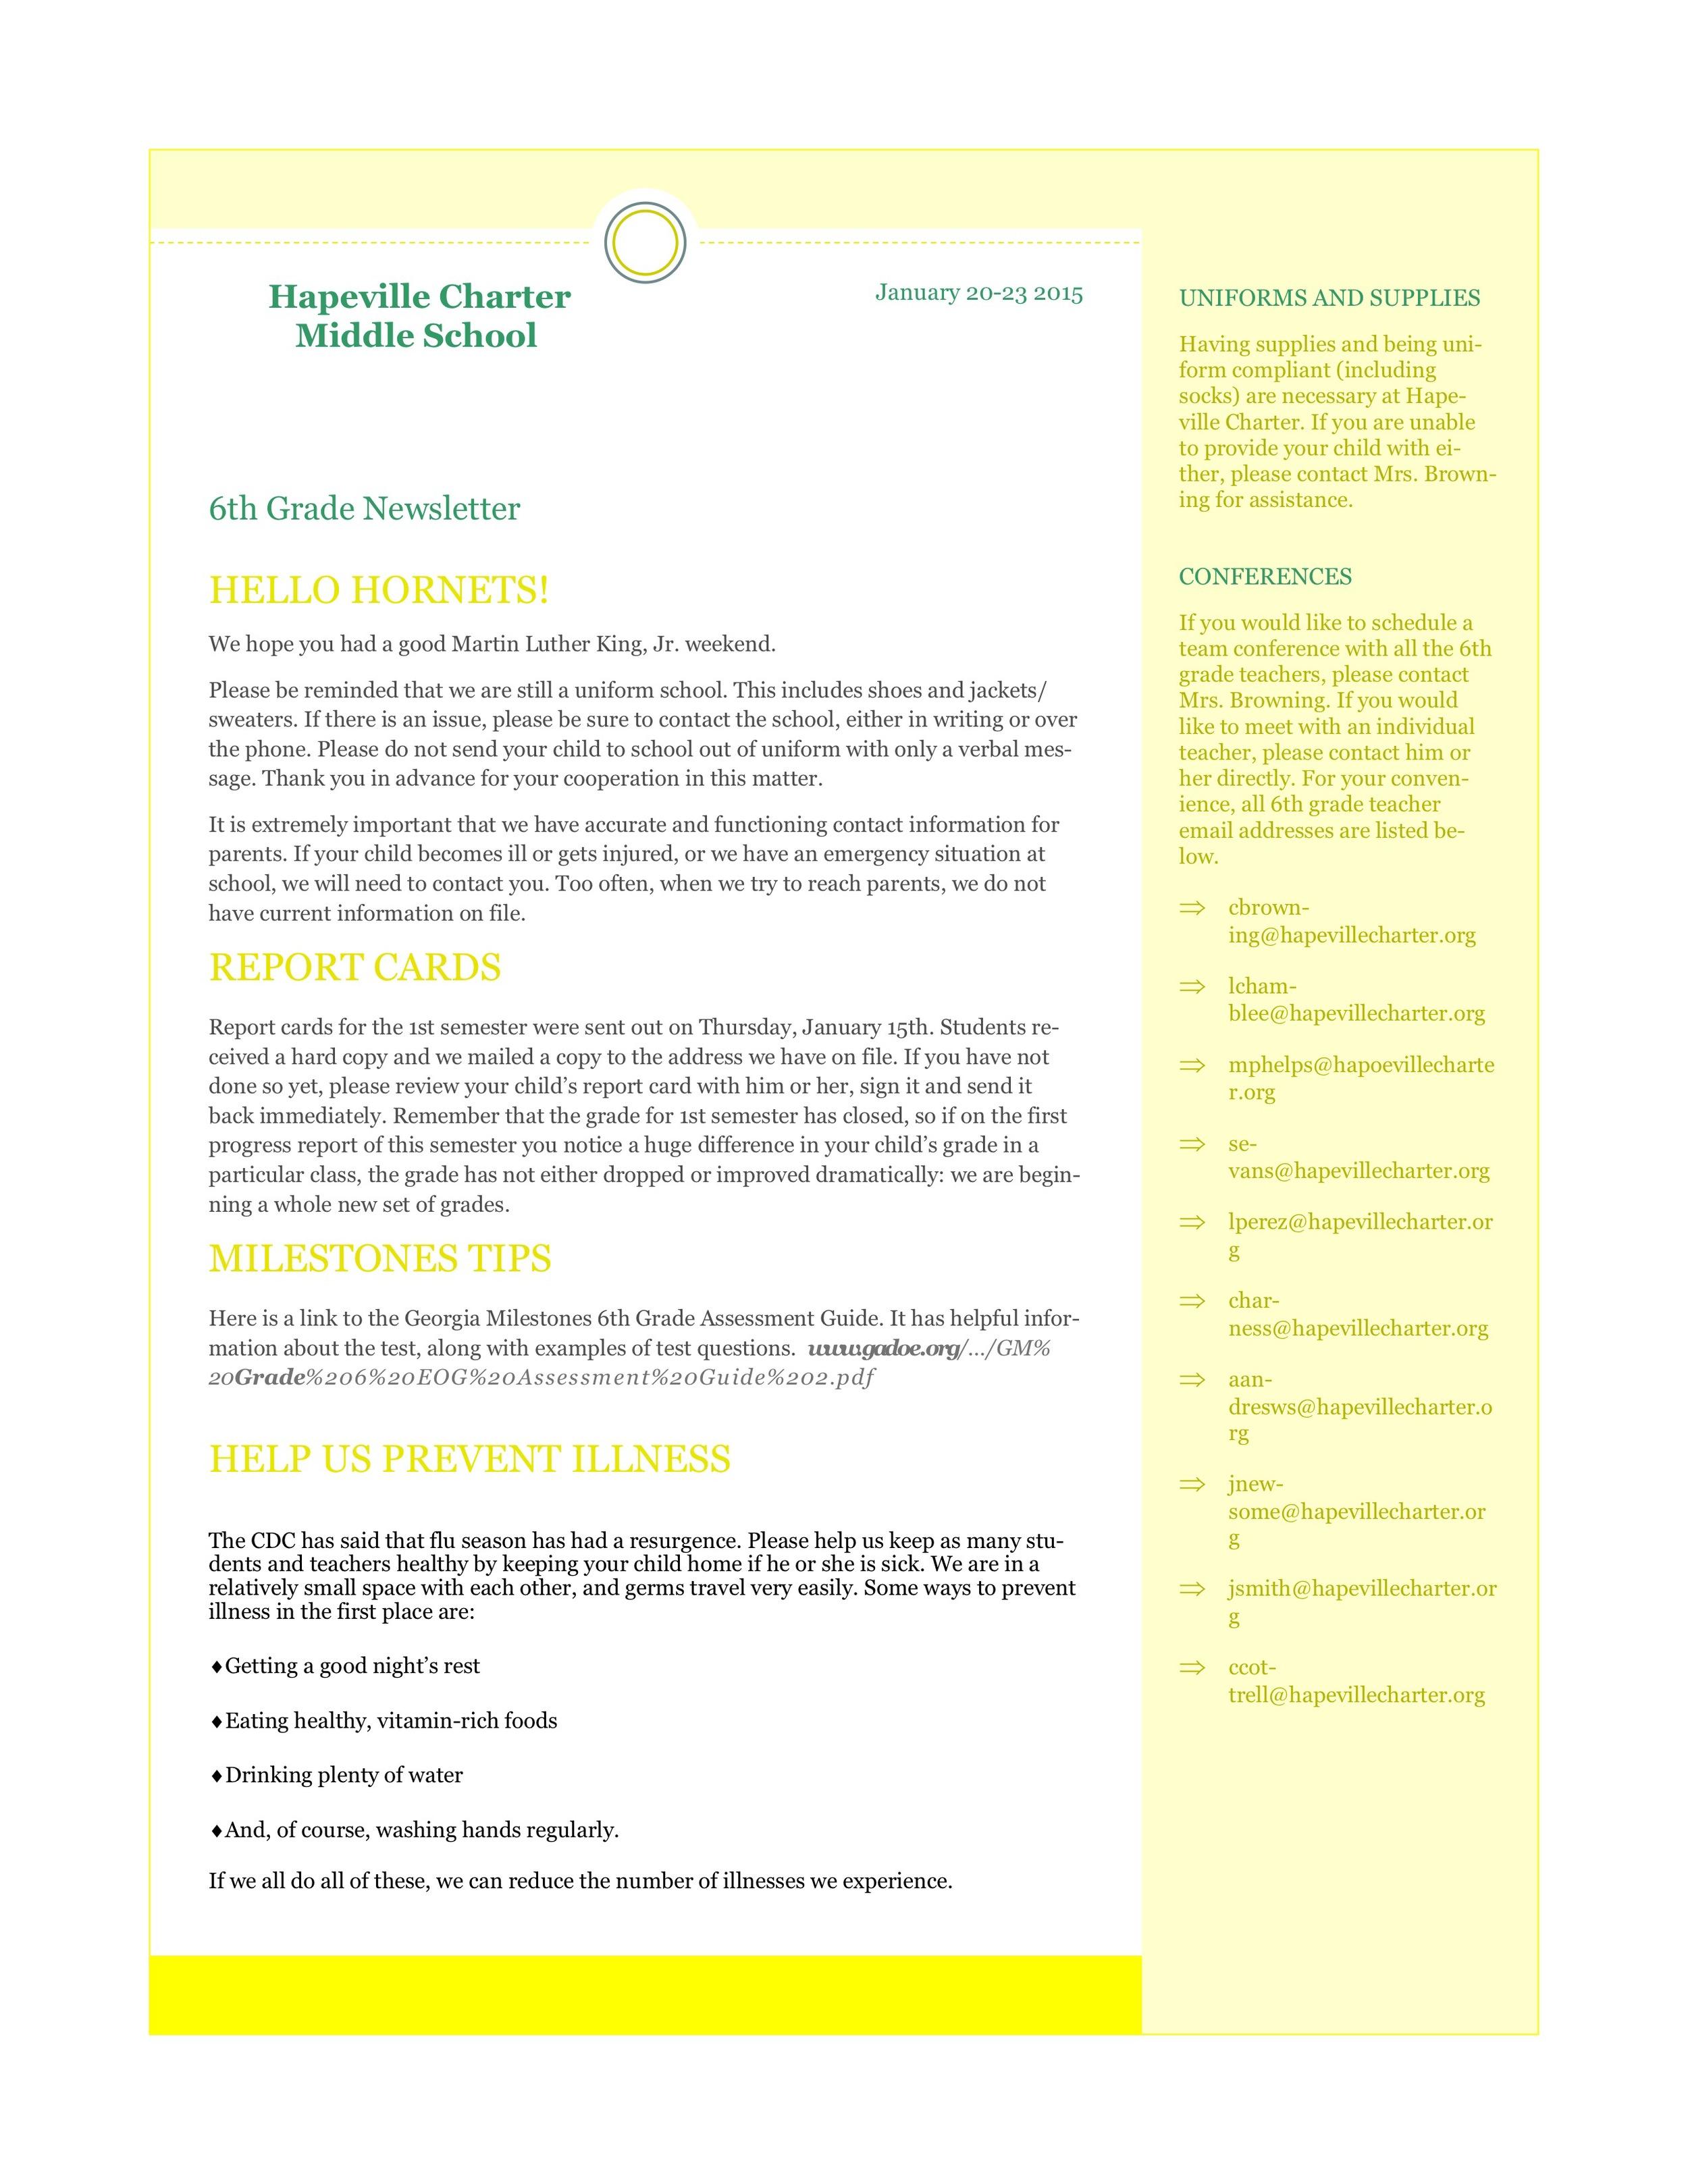 Newsletter Image6th grade January 20-23.jpeg